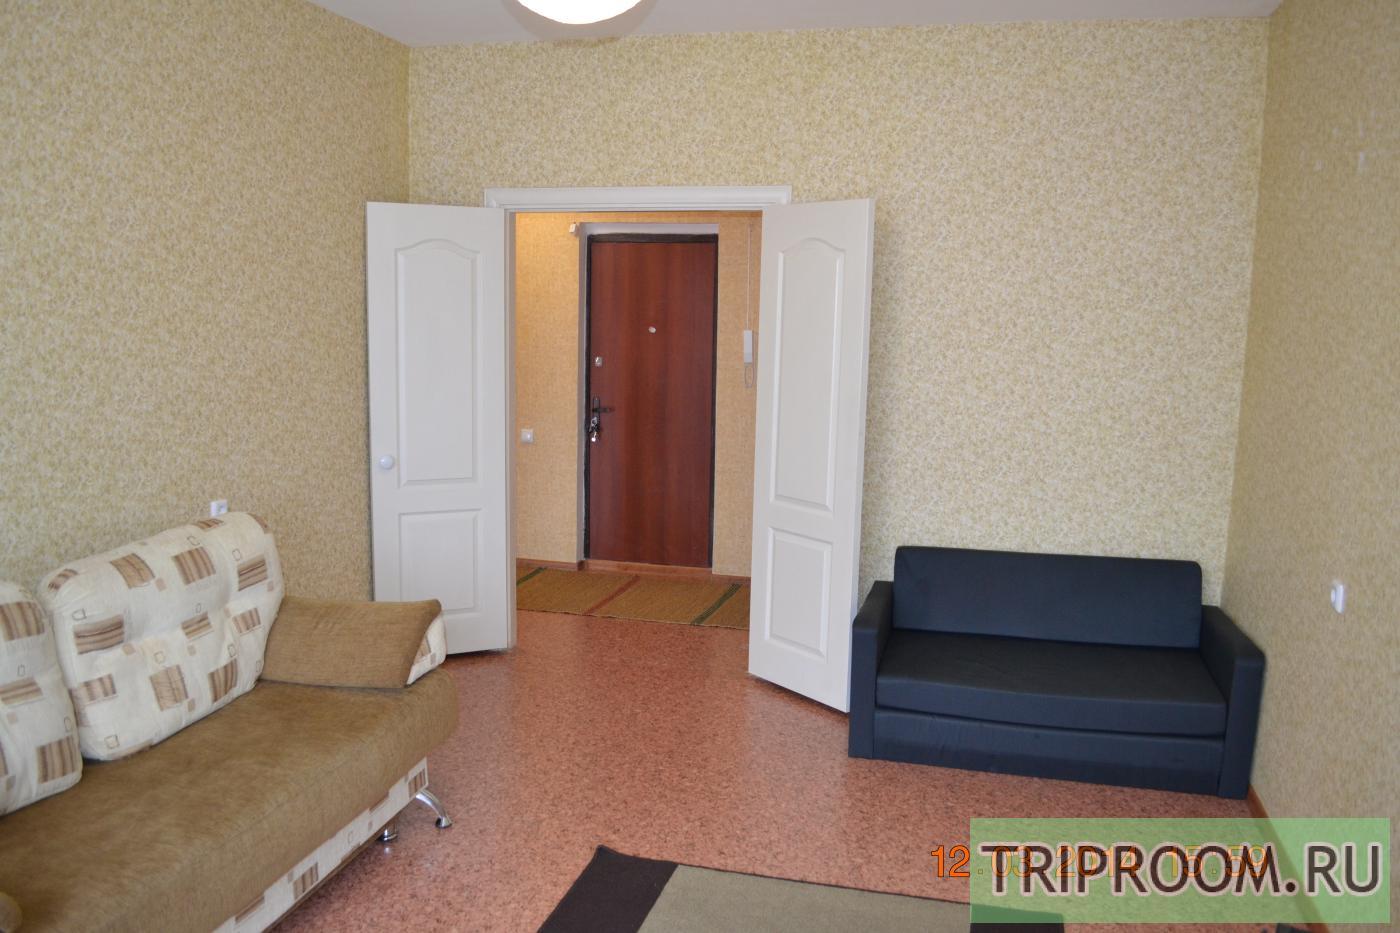 1-комнатная квартира посуточно (вариант № 4803), ул. Ломоносова улица, фото № 3